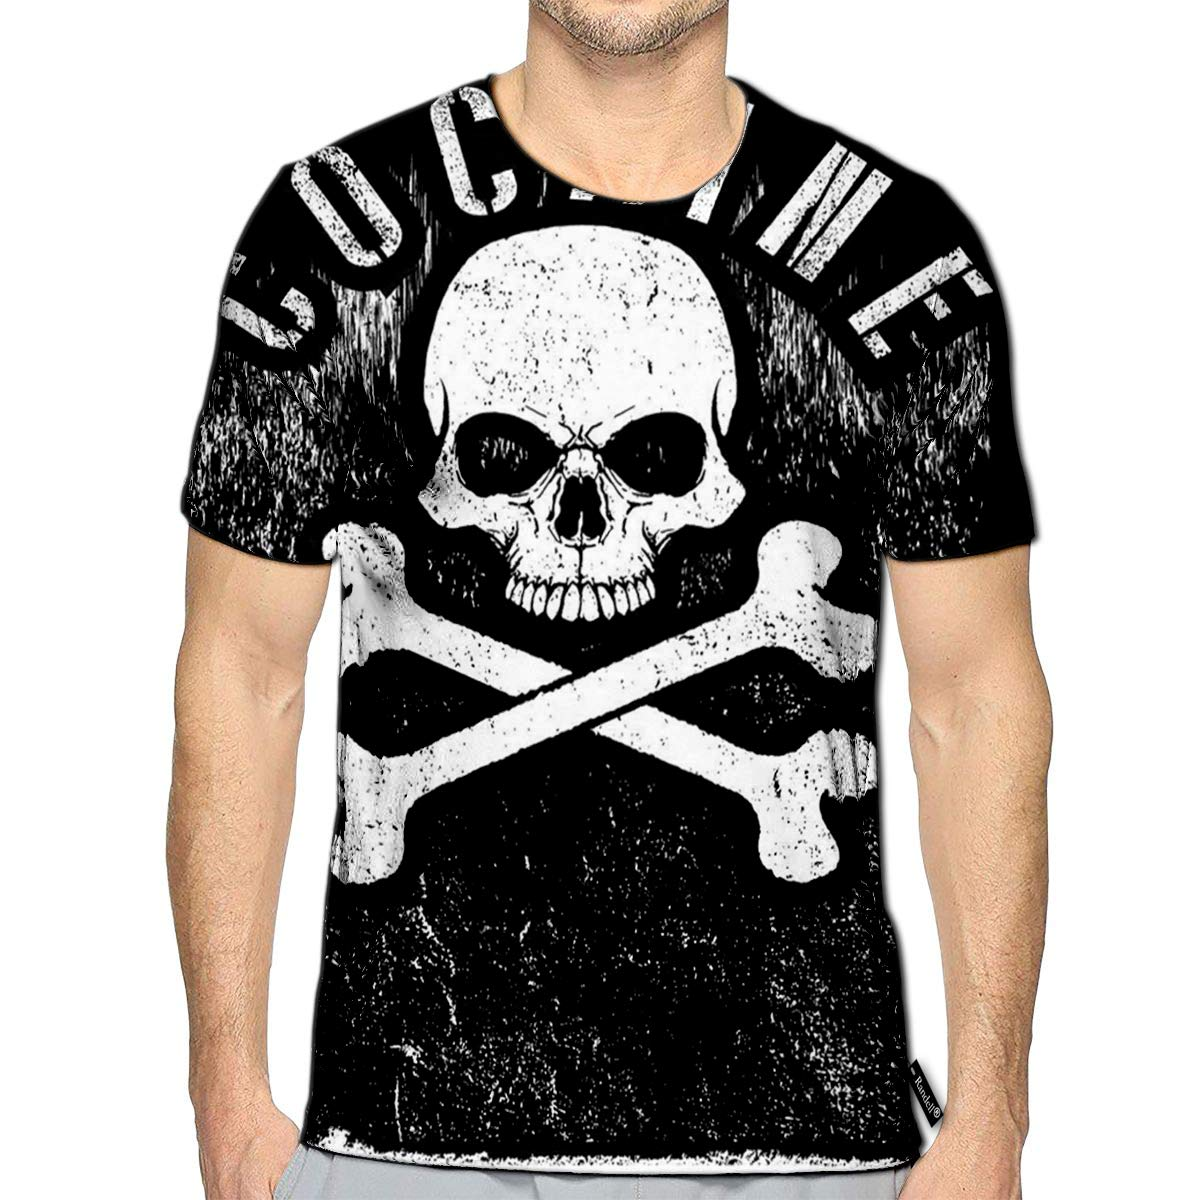 Randell 3D Printed T-Shirts Skull Cocaime Short Sleeve Tops Tees